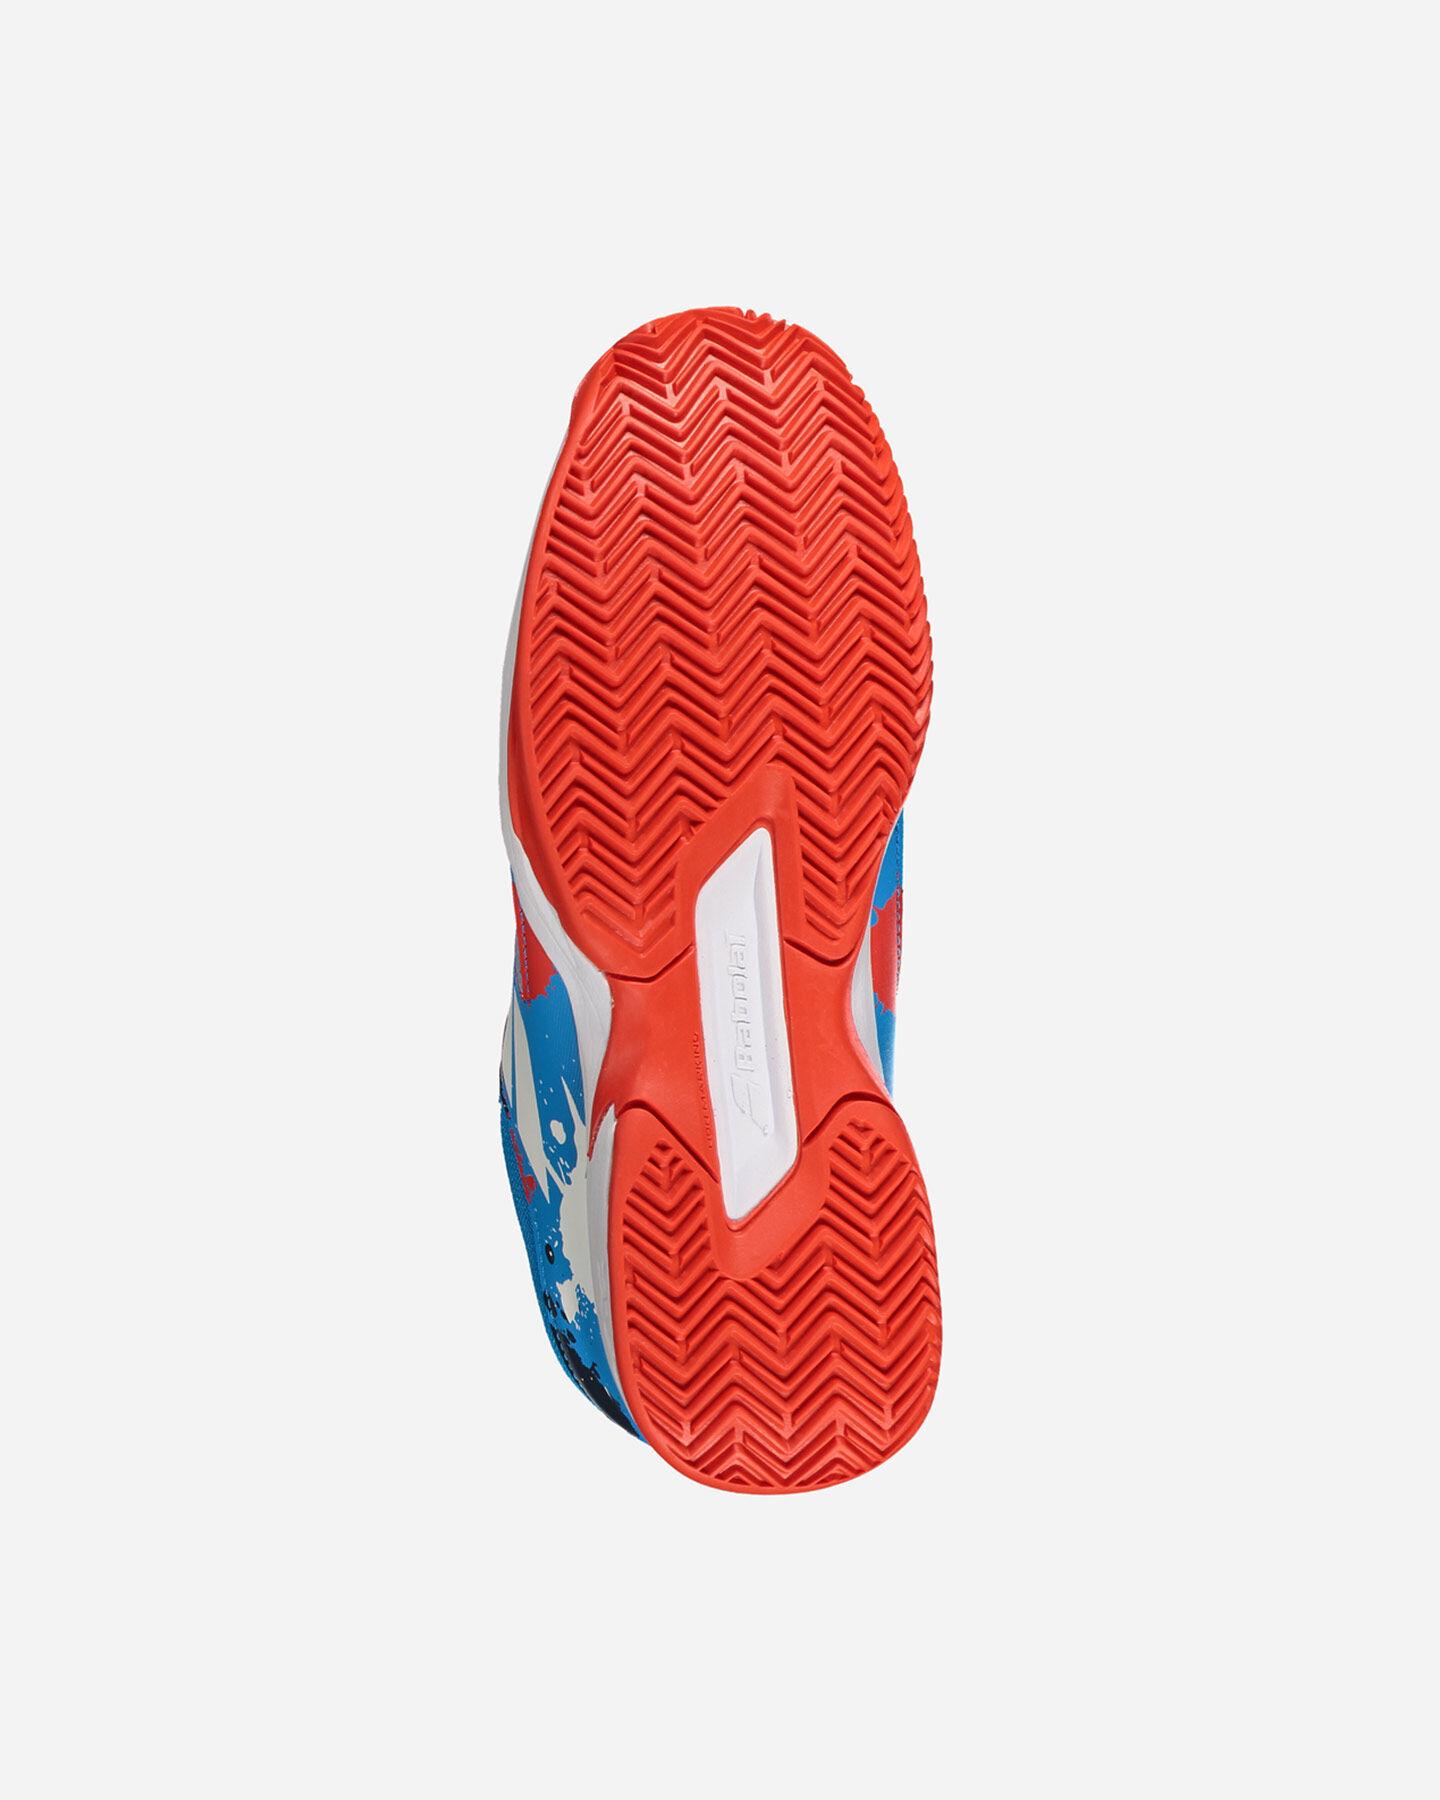 Scarpe tennis BABOLAT PULSION CLAY JR S5185958 scatto 2